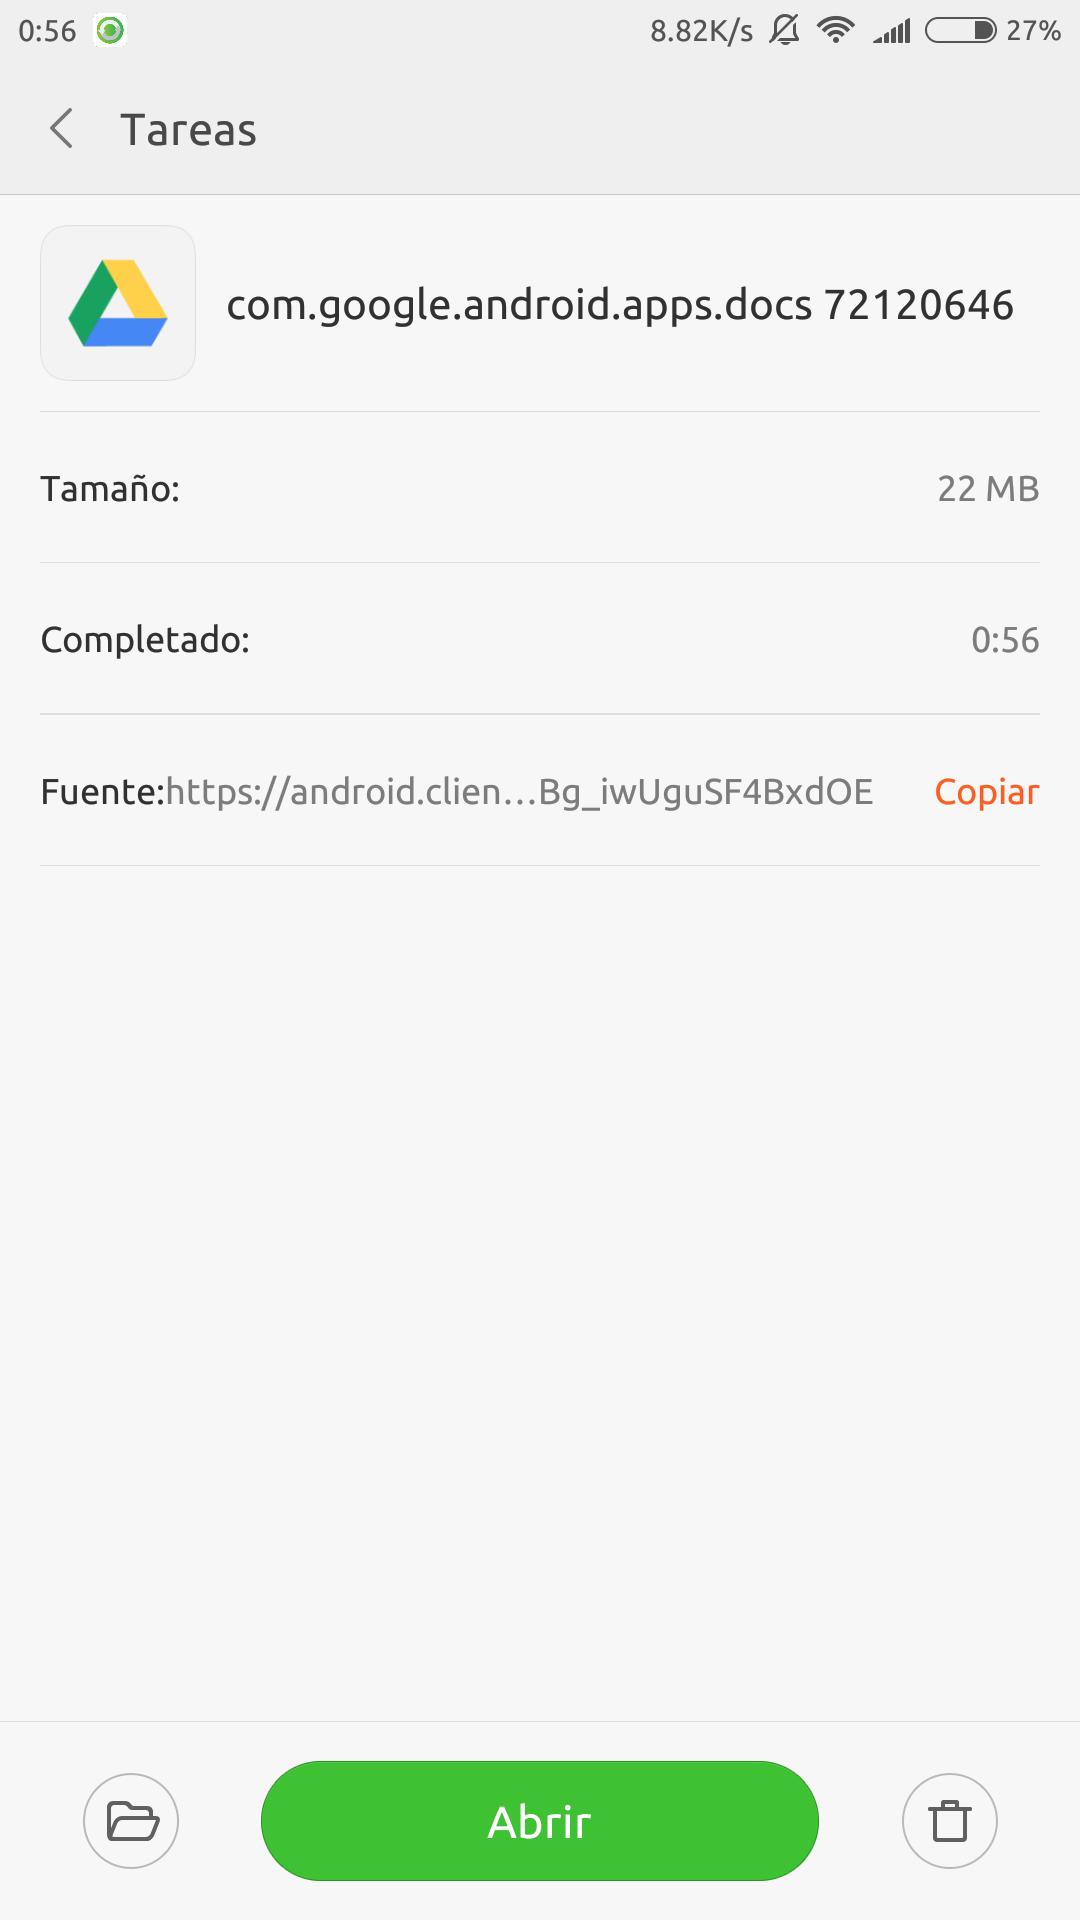 screenshot_2017-06-29-00-56-43-863_com android providers downloads ui